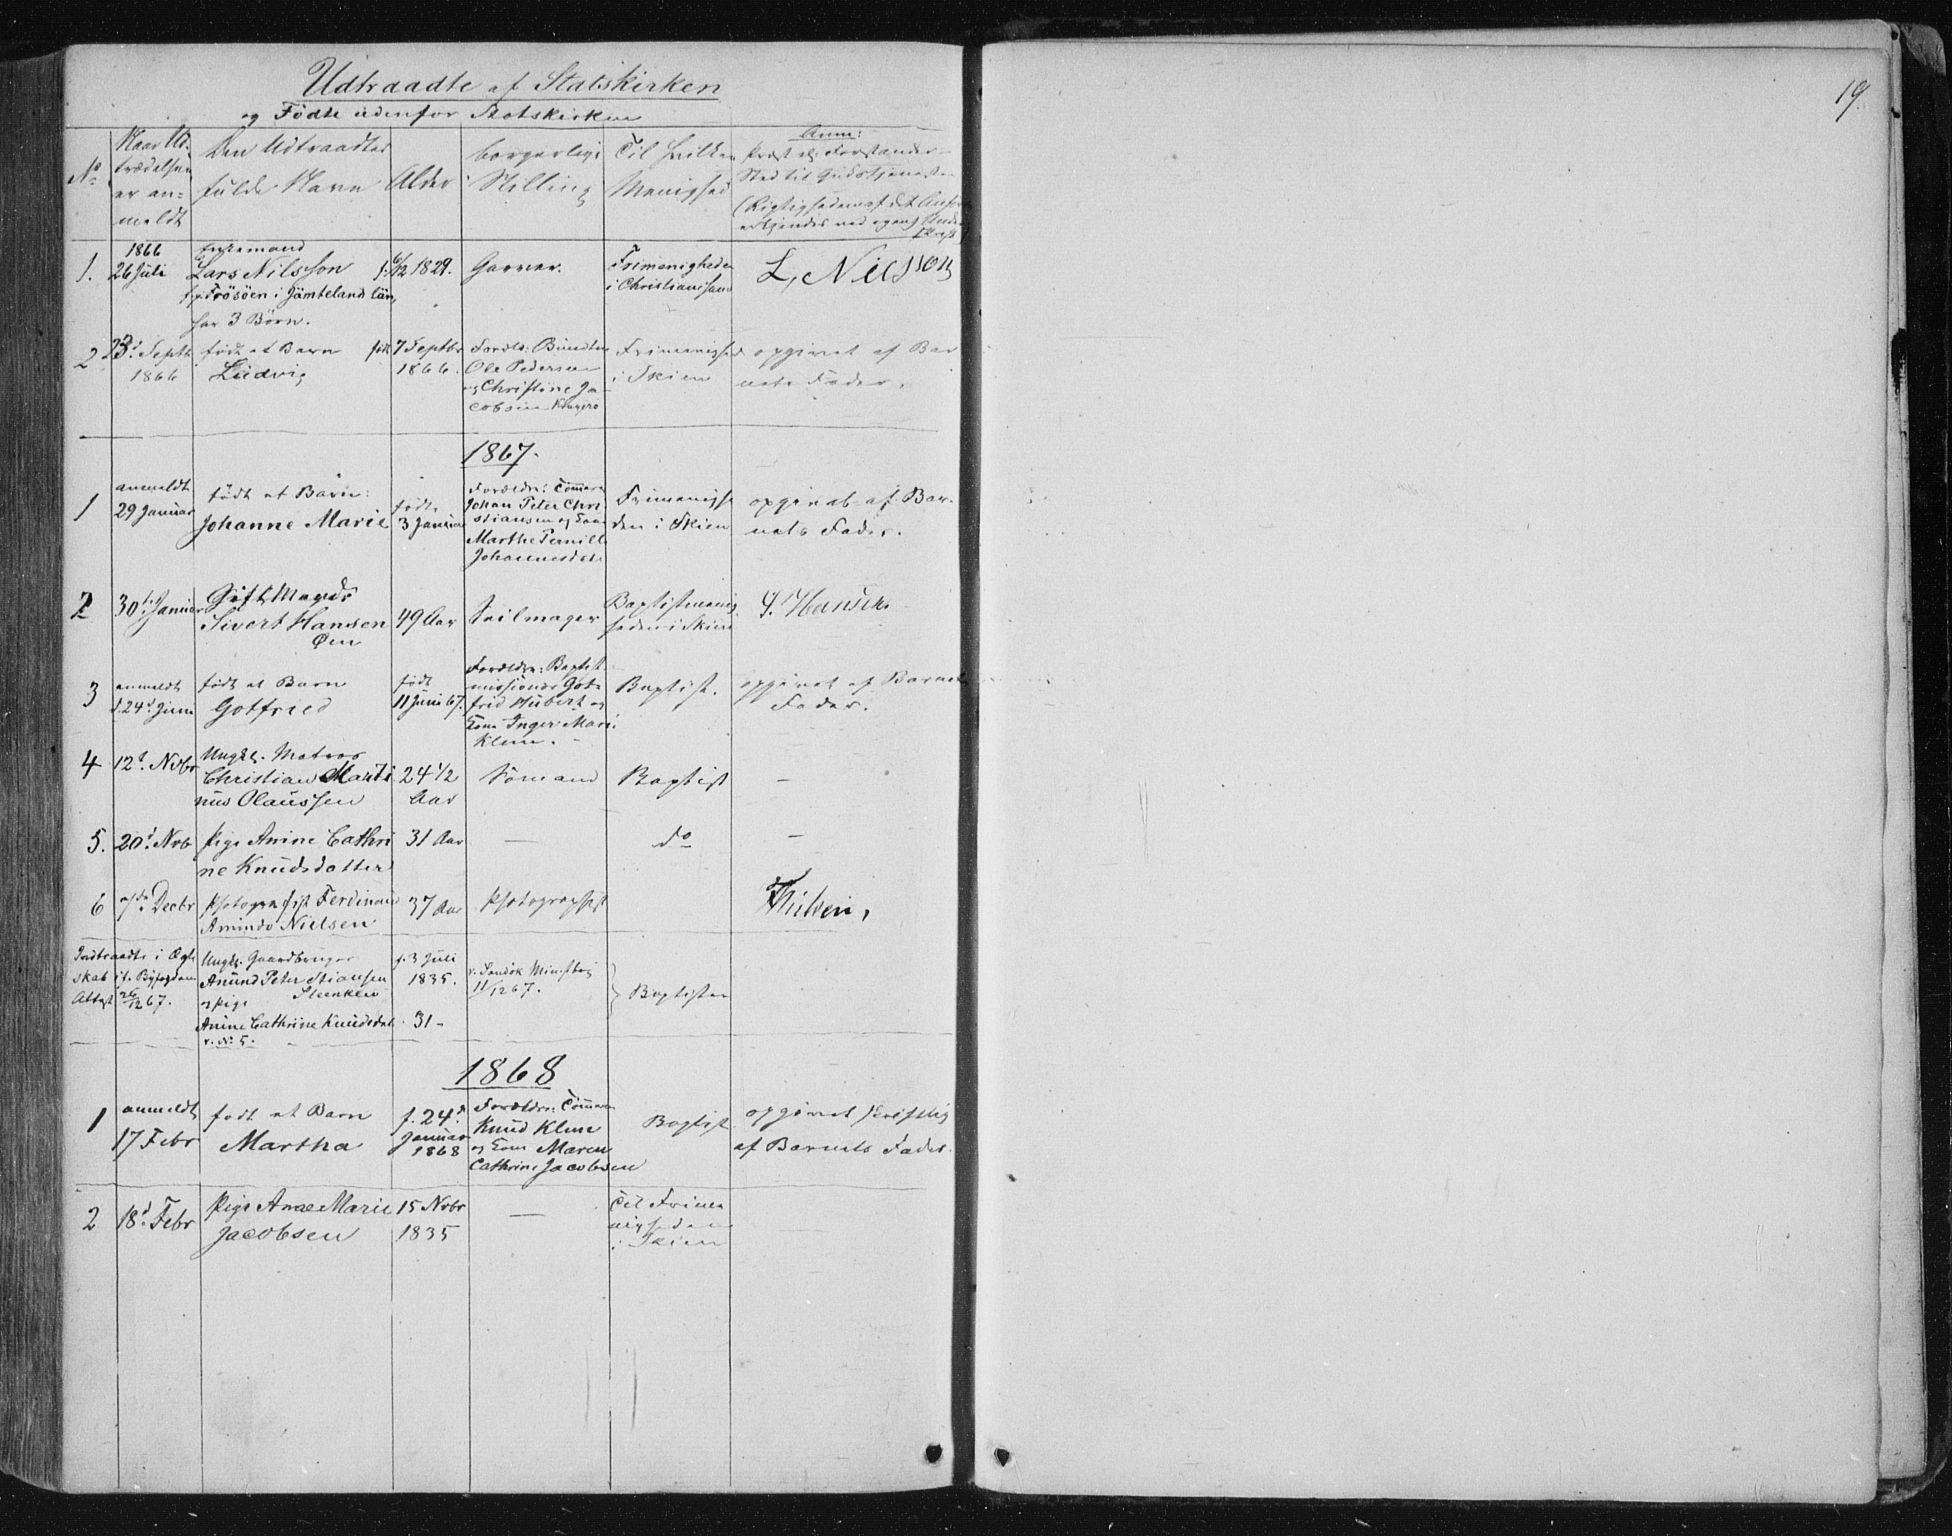 SAKO, Kragerø kirkebøker, F/Fa/L0006: Ministerialbok nr. 6, 1847-1861, s. 19